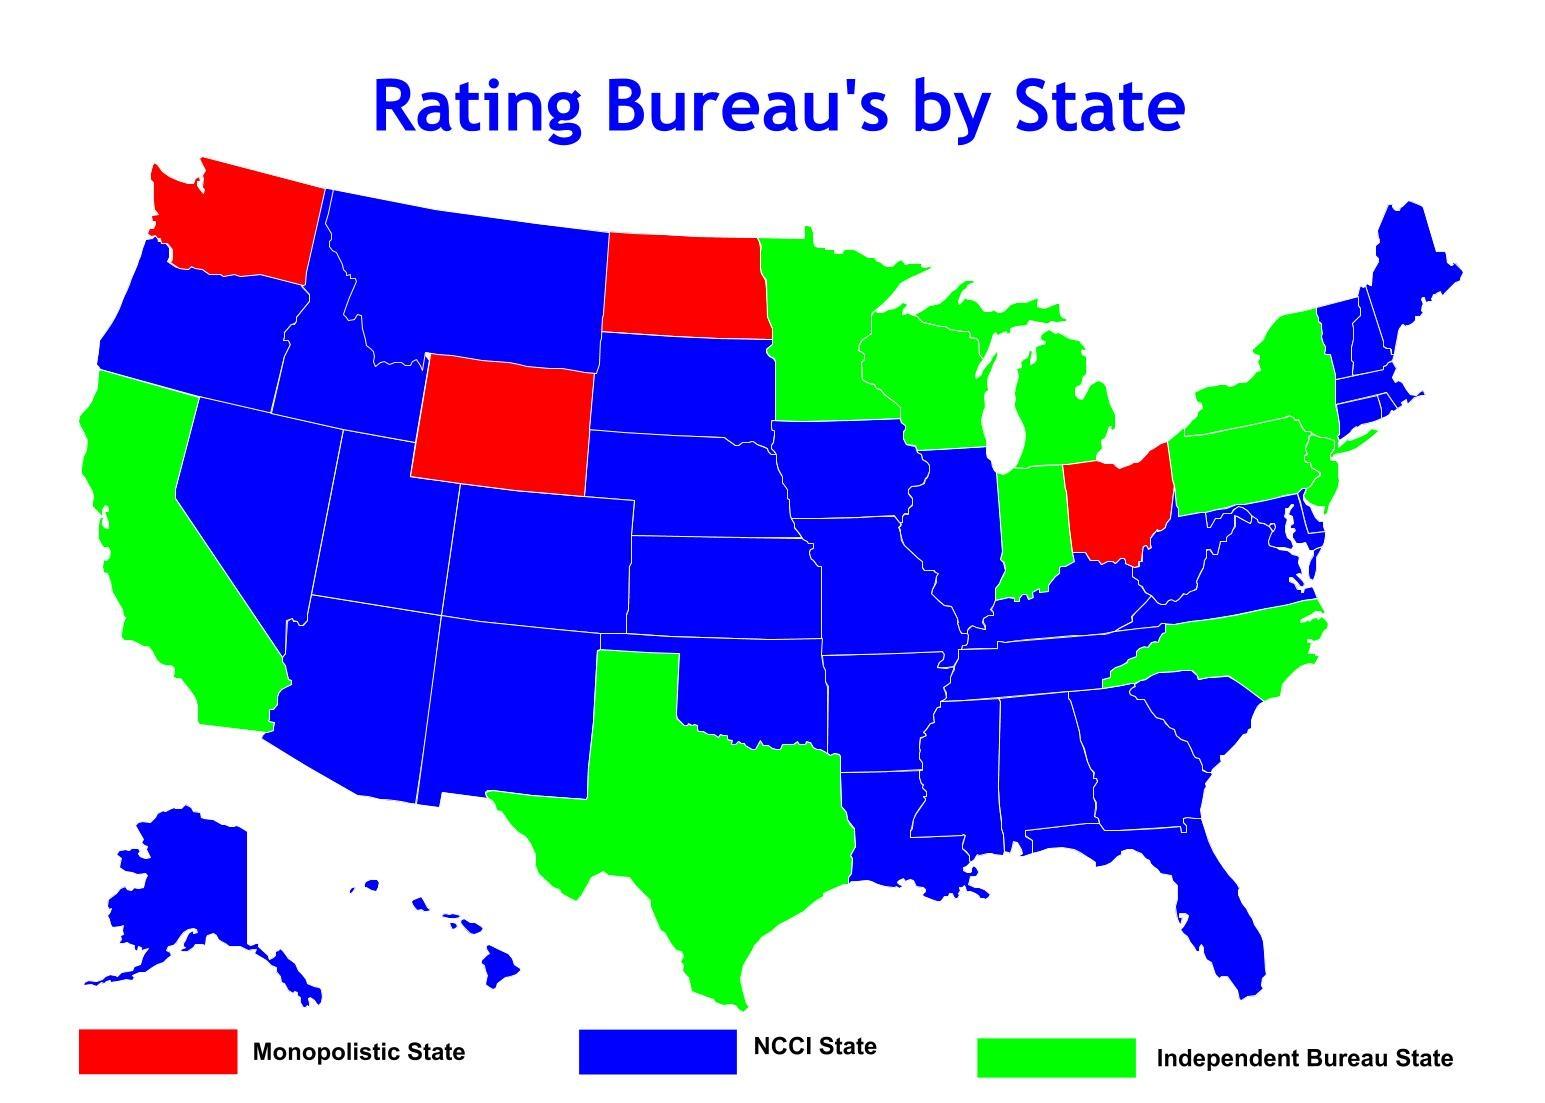 Ncci States Monopolistic States And Independent Bureau